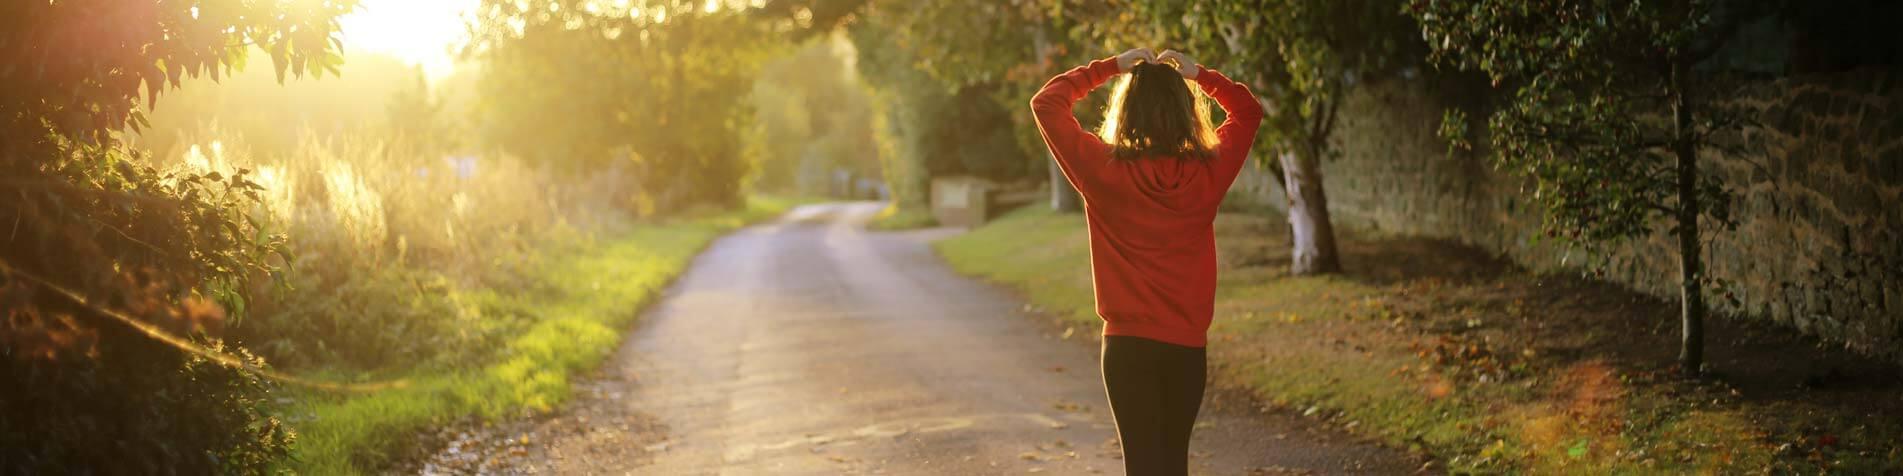 Woman on a walk